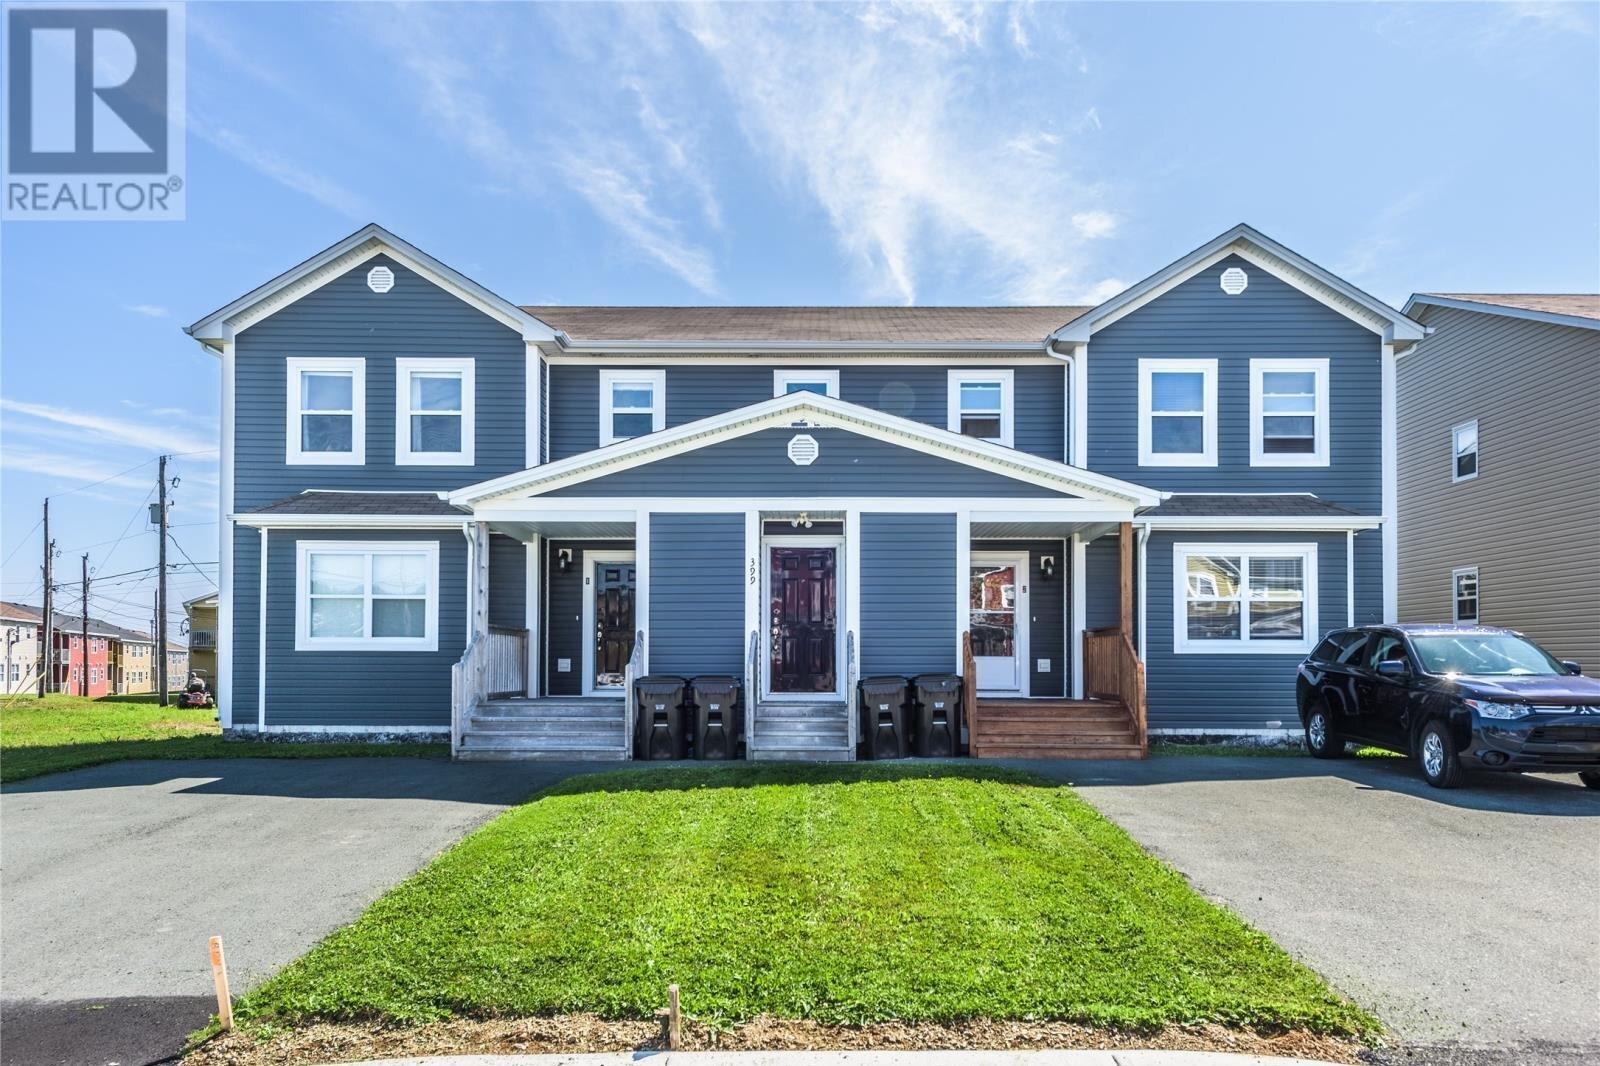 House for sale at 399 Blackmarsh Rd St. John's Newfoundland - MLS: 1224132